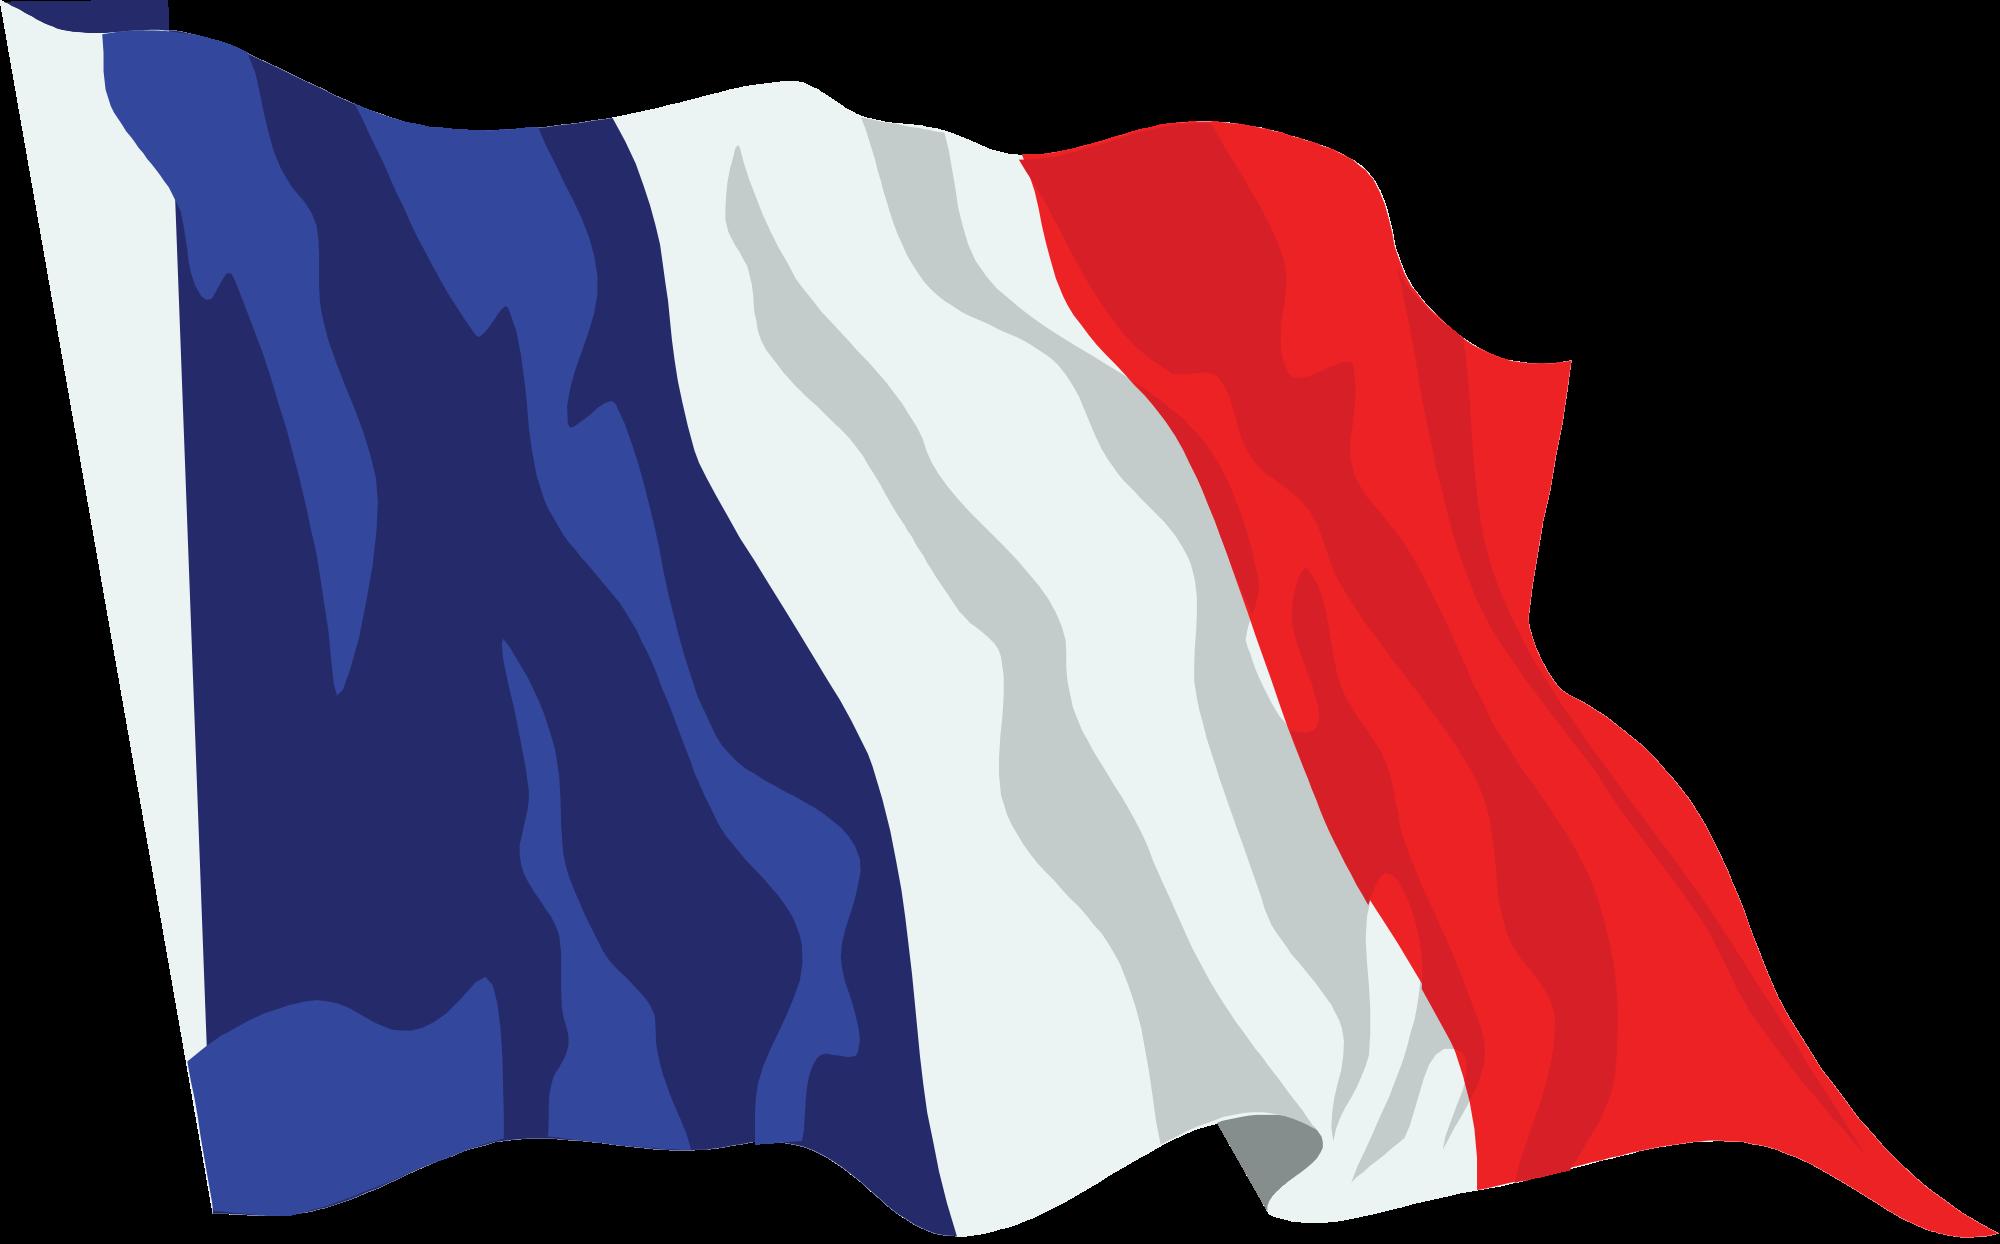 German clipart wavy. France flag png image